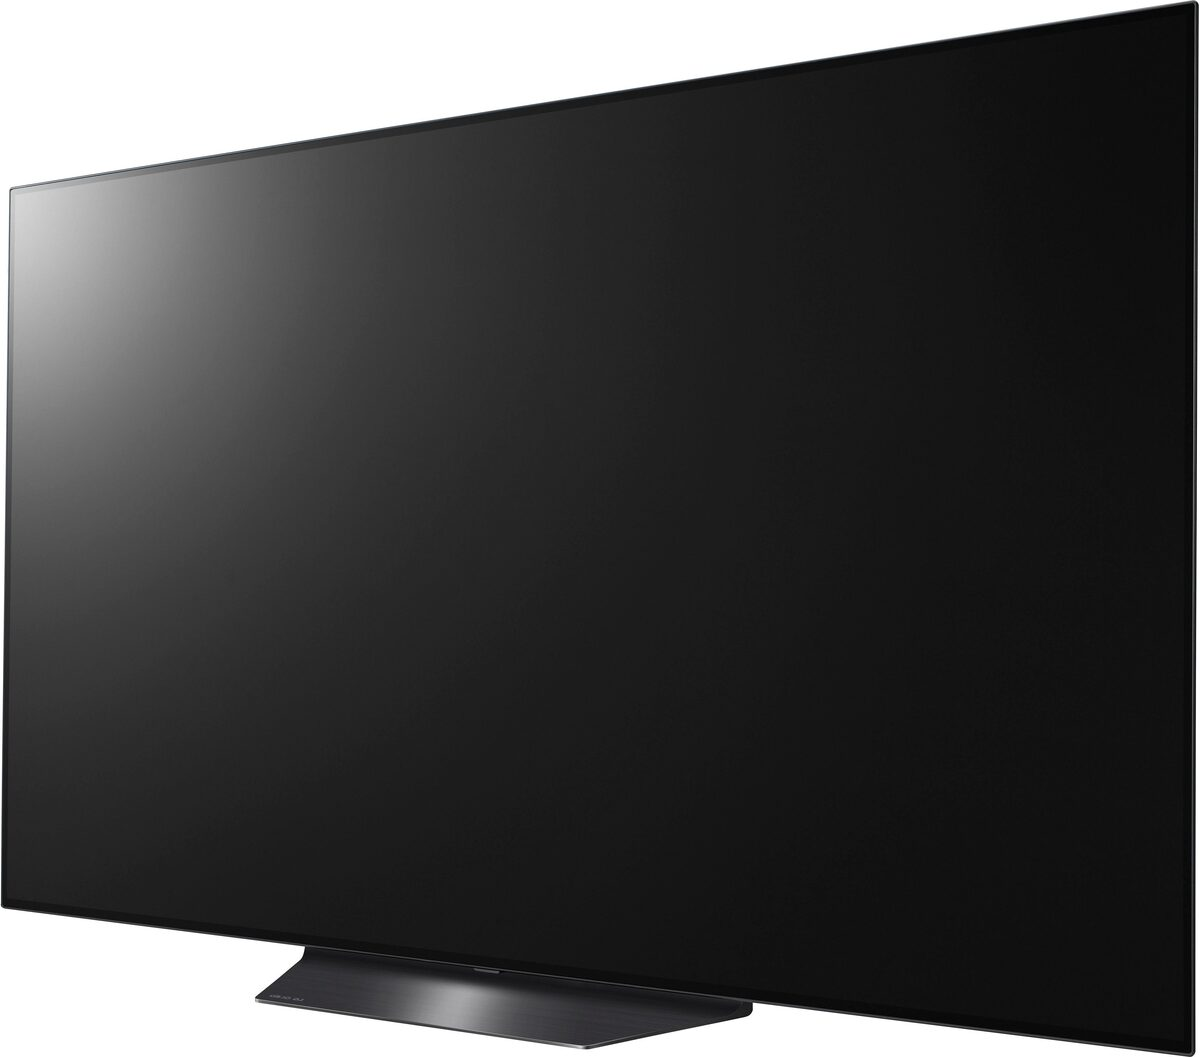 Bild 3 von LG OLED65B9SLA OLED-Fernseher (164 cm/65 Zoll, 4K Ultra HD, Smart-TV)